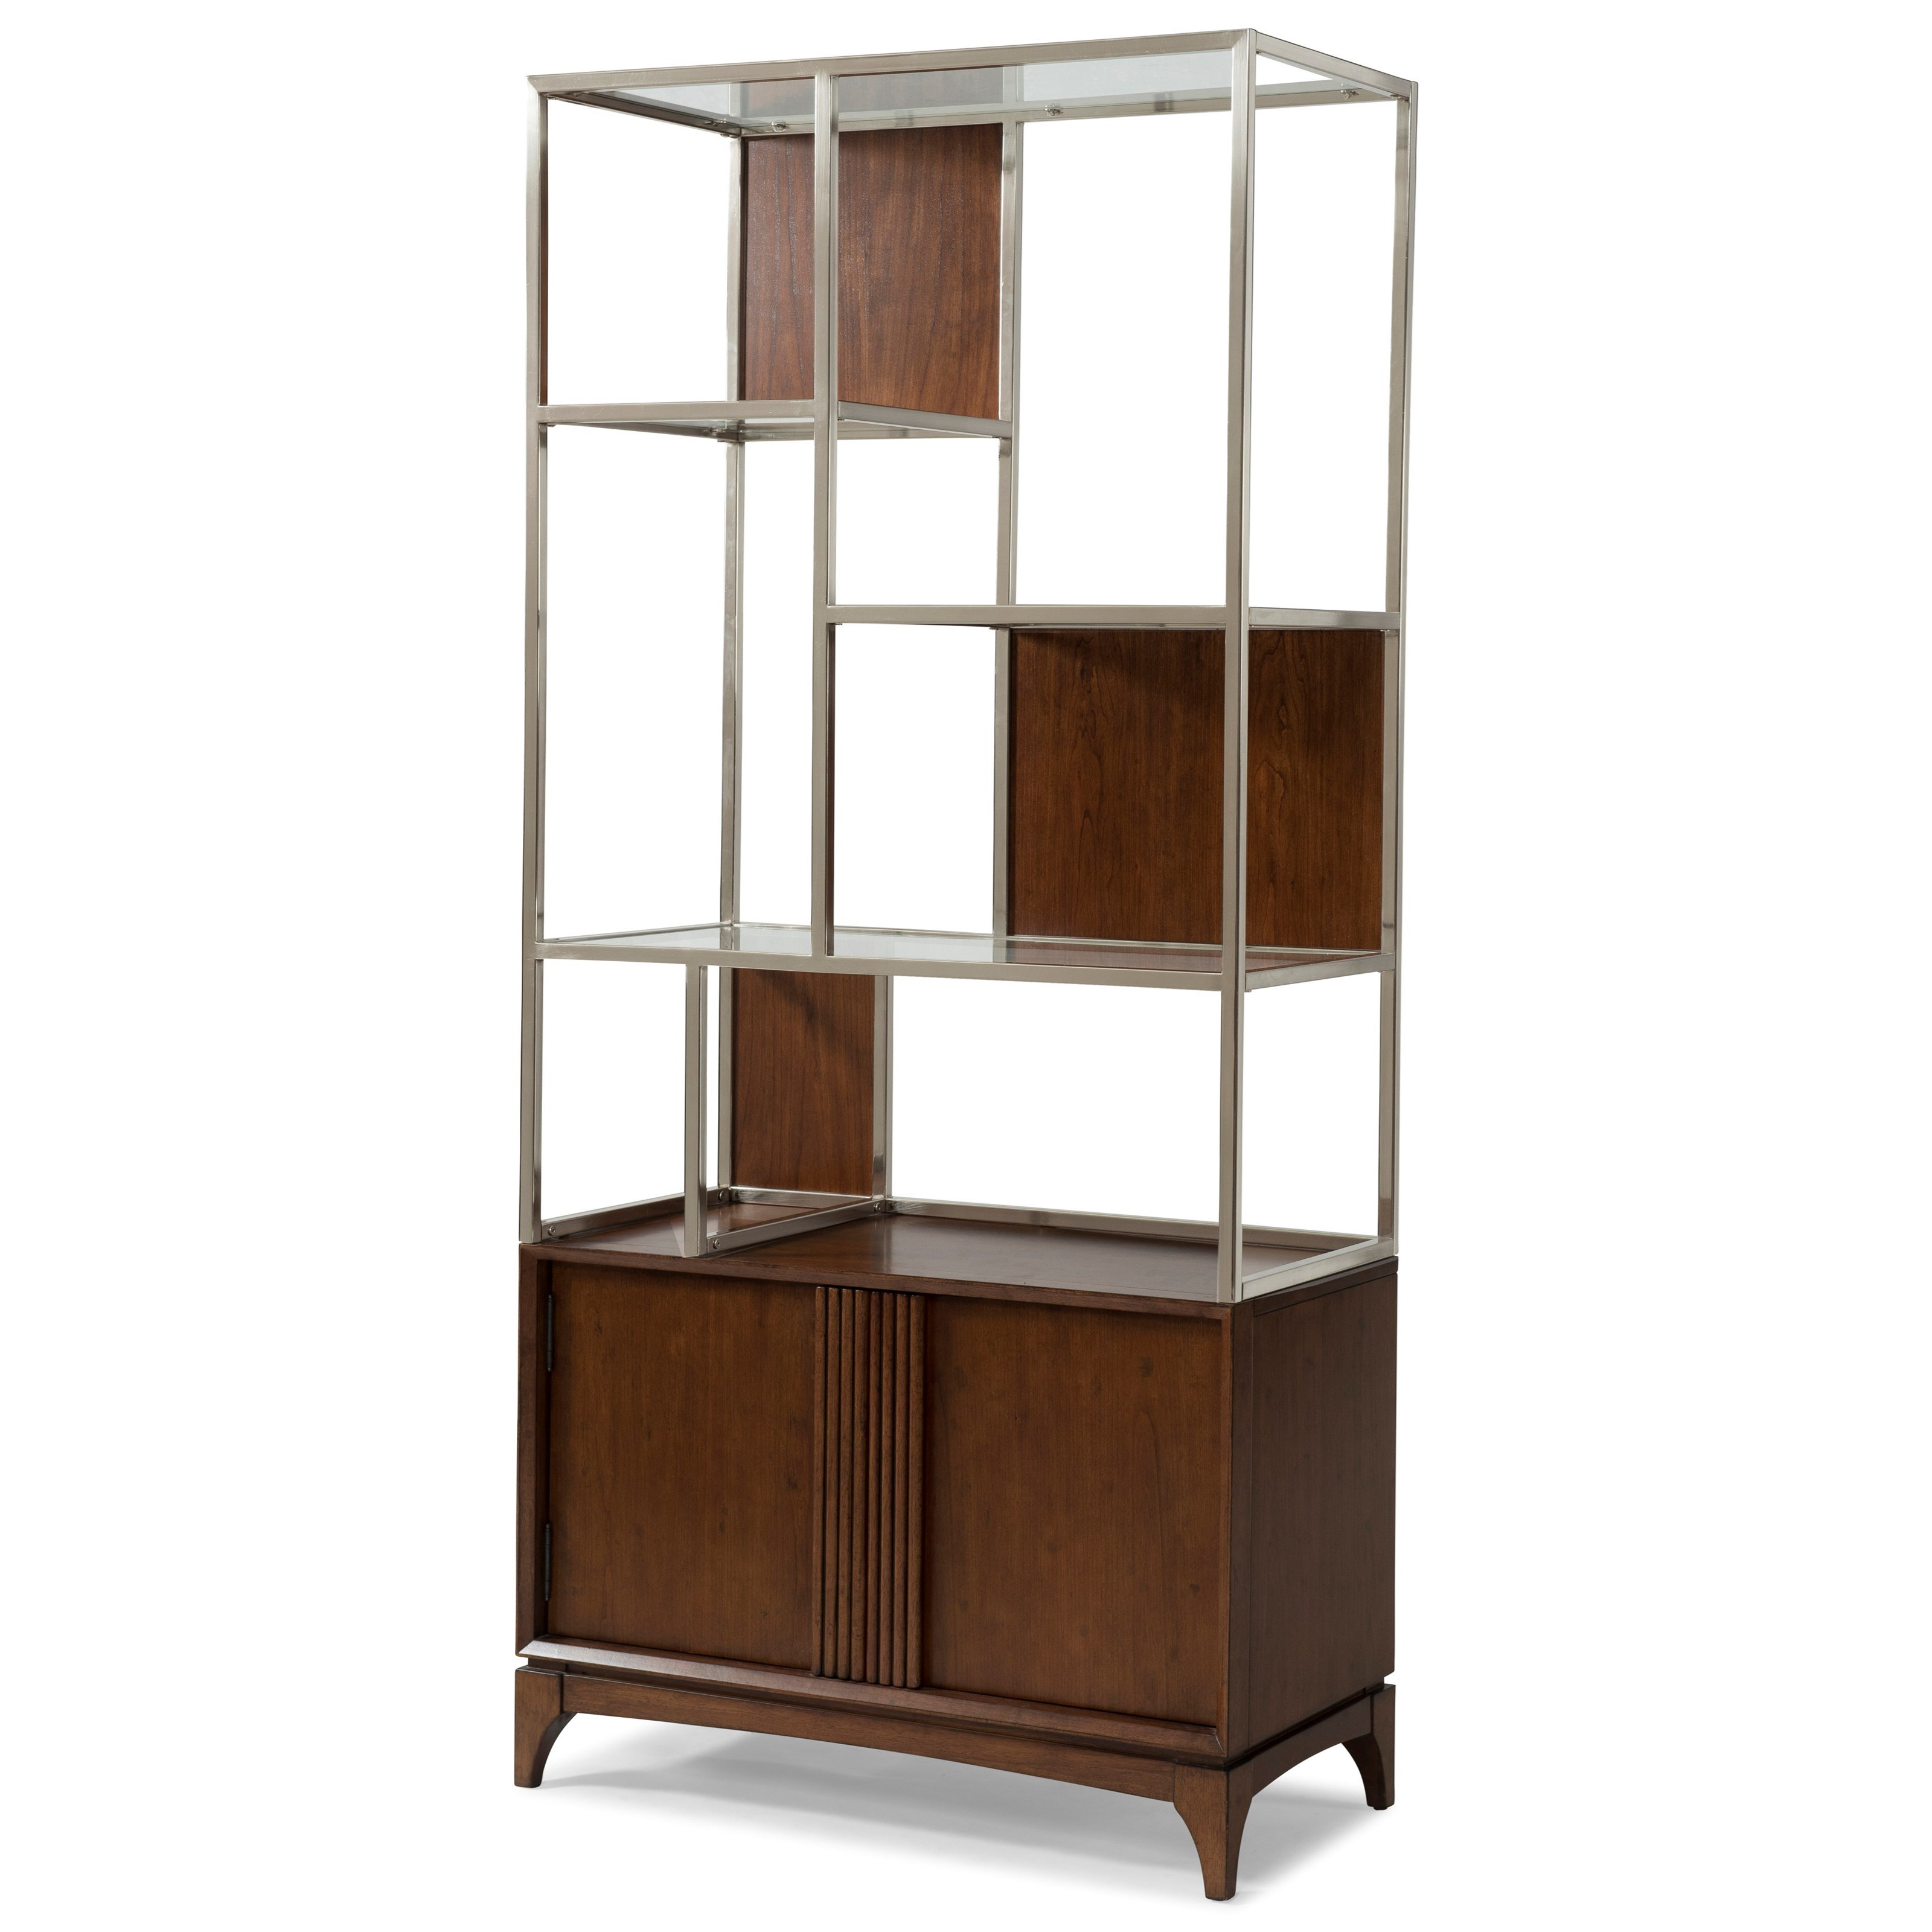 Plaza Display Cabinet